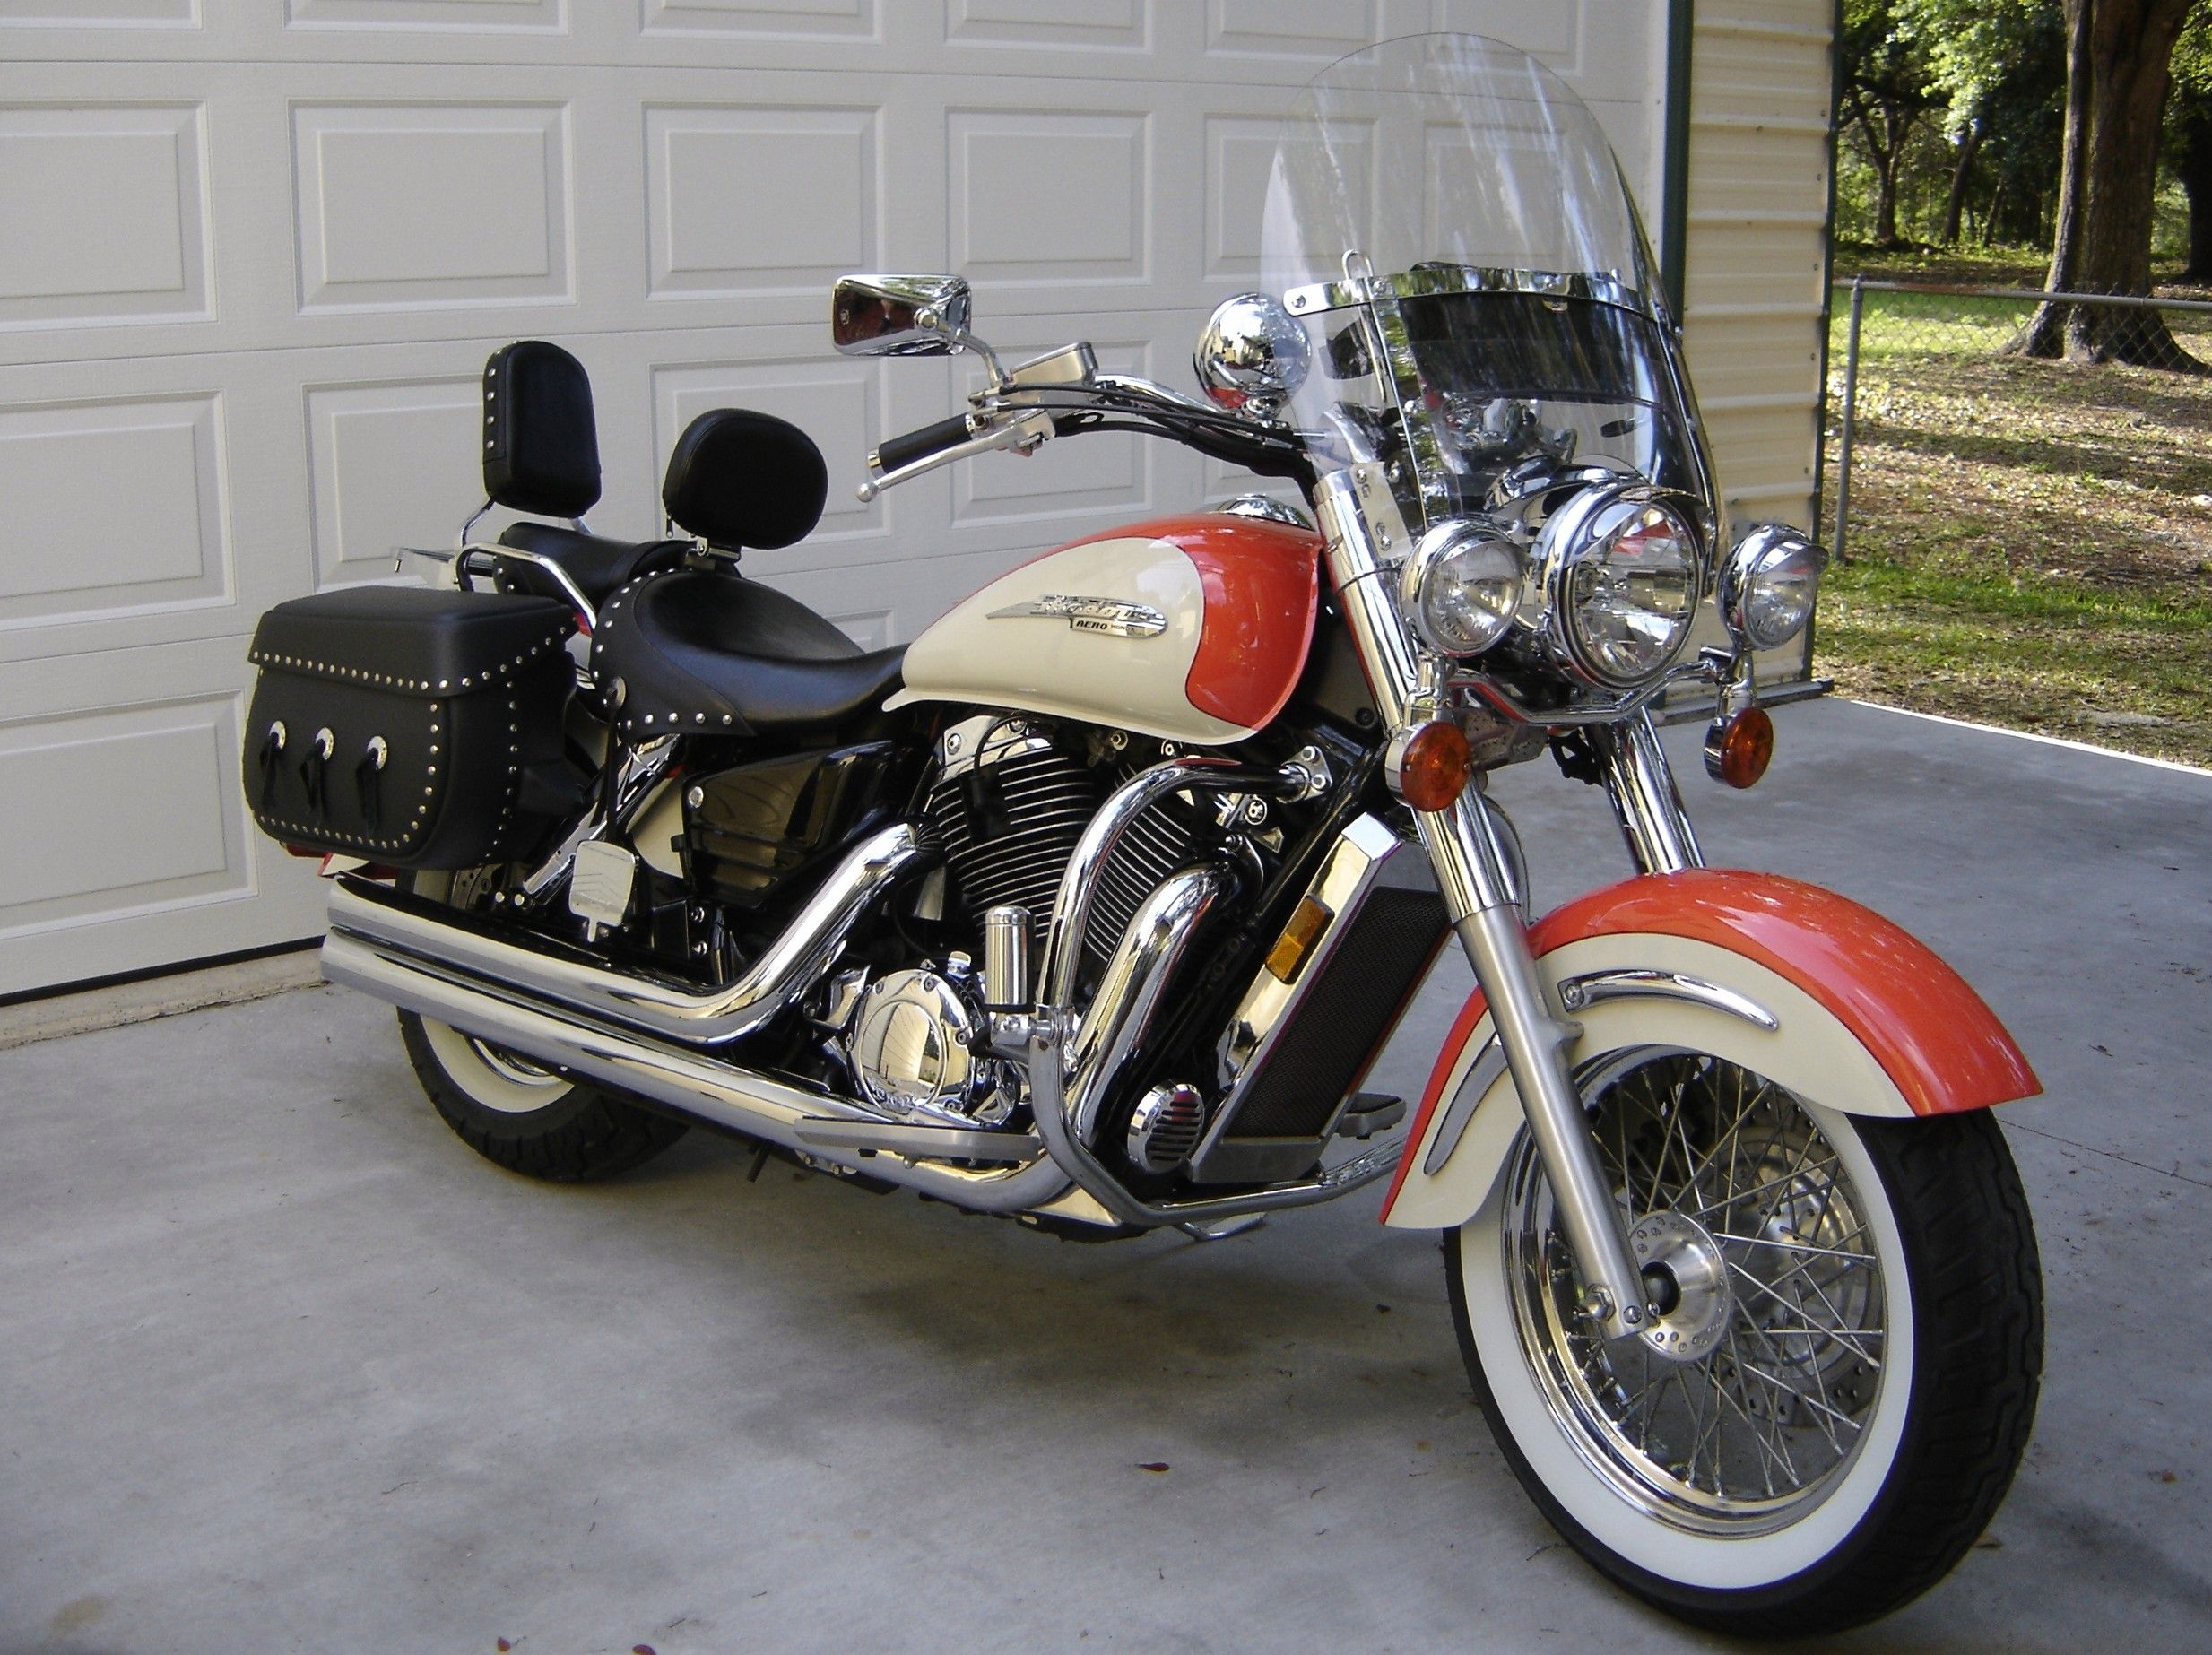 small resolution of my ride 1999 honda shadow aero 1100